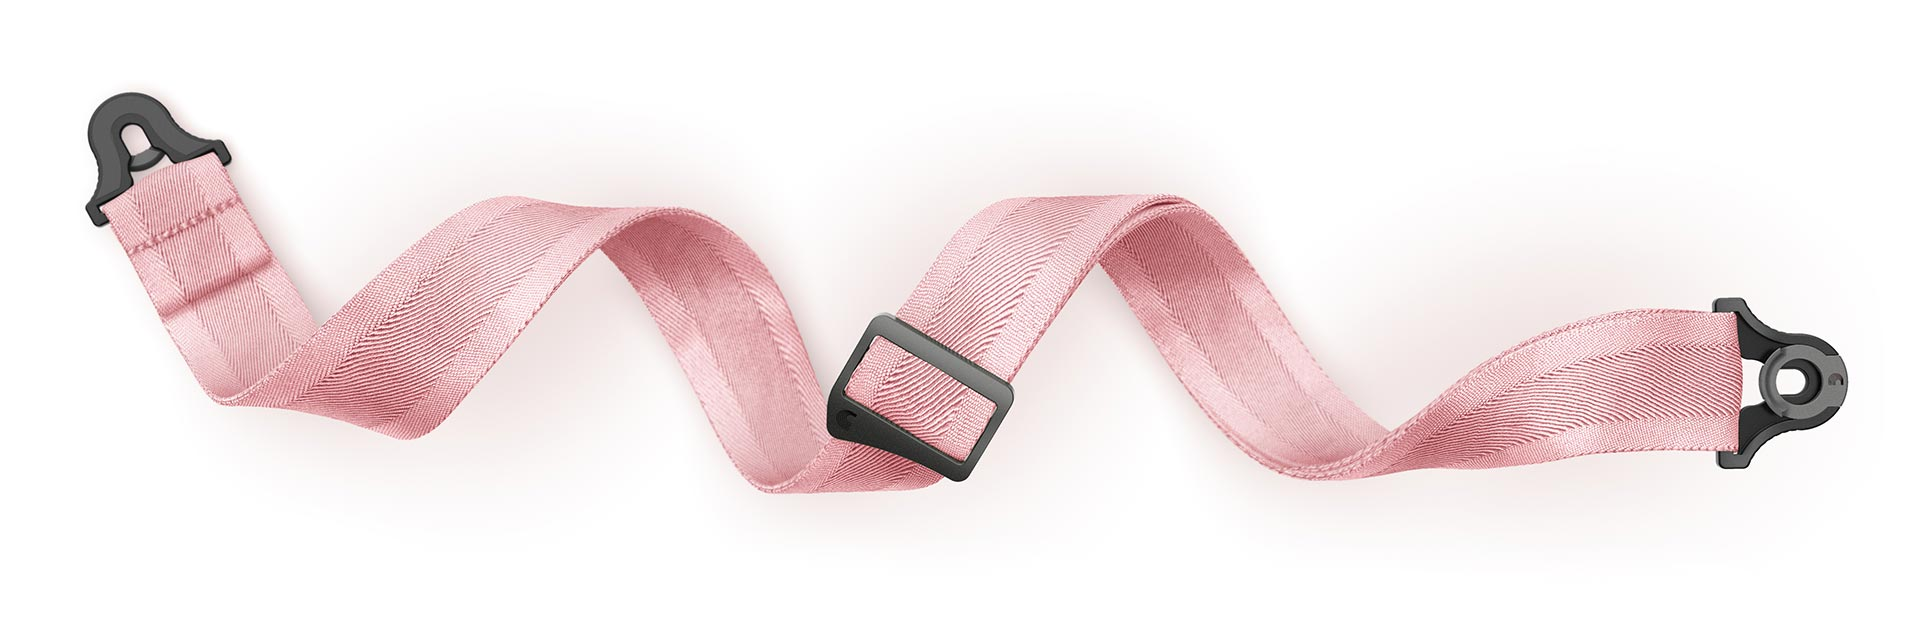 Strap 3D Rendering Pink